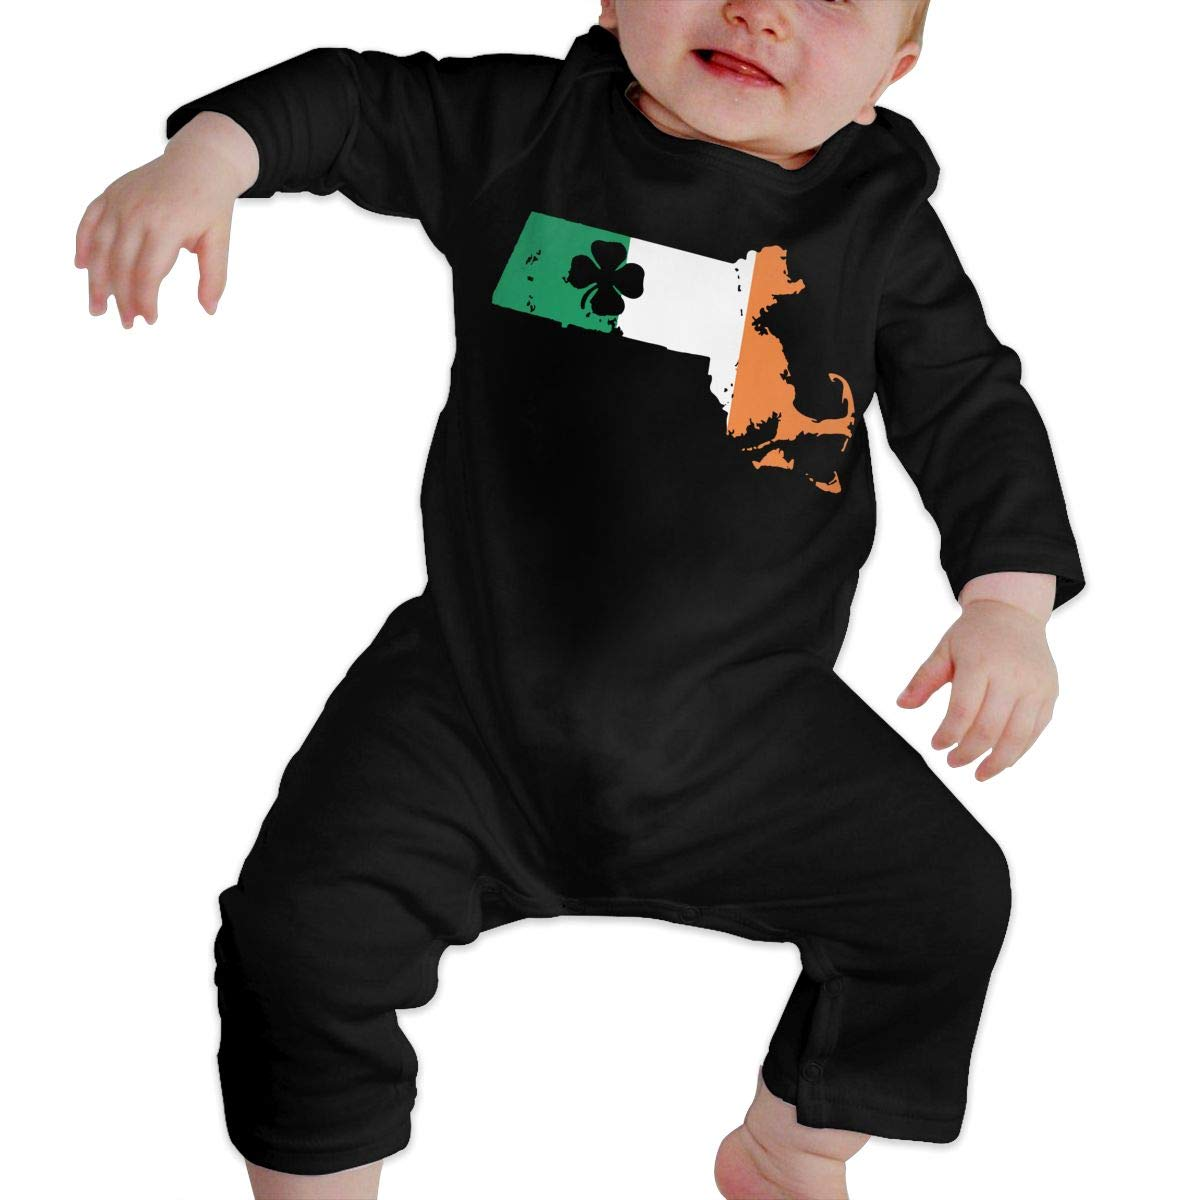 Patricks Day Massachusetts Irish Flag Newborn Baby Girl Infant Sleep and Play Bodysuit Jumpsuit Outfits LBJQ8 St